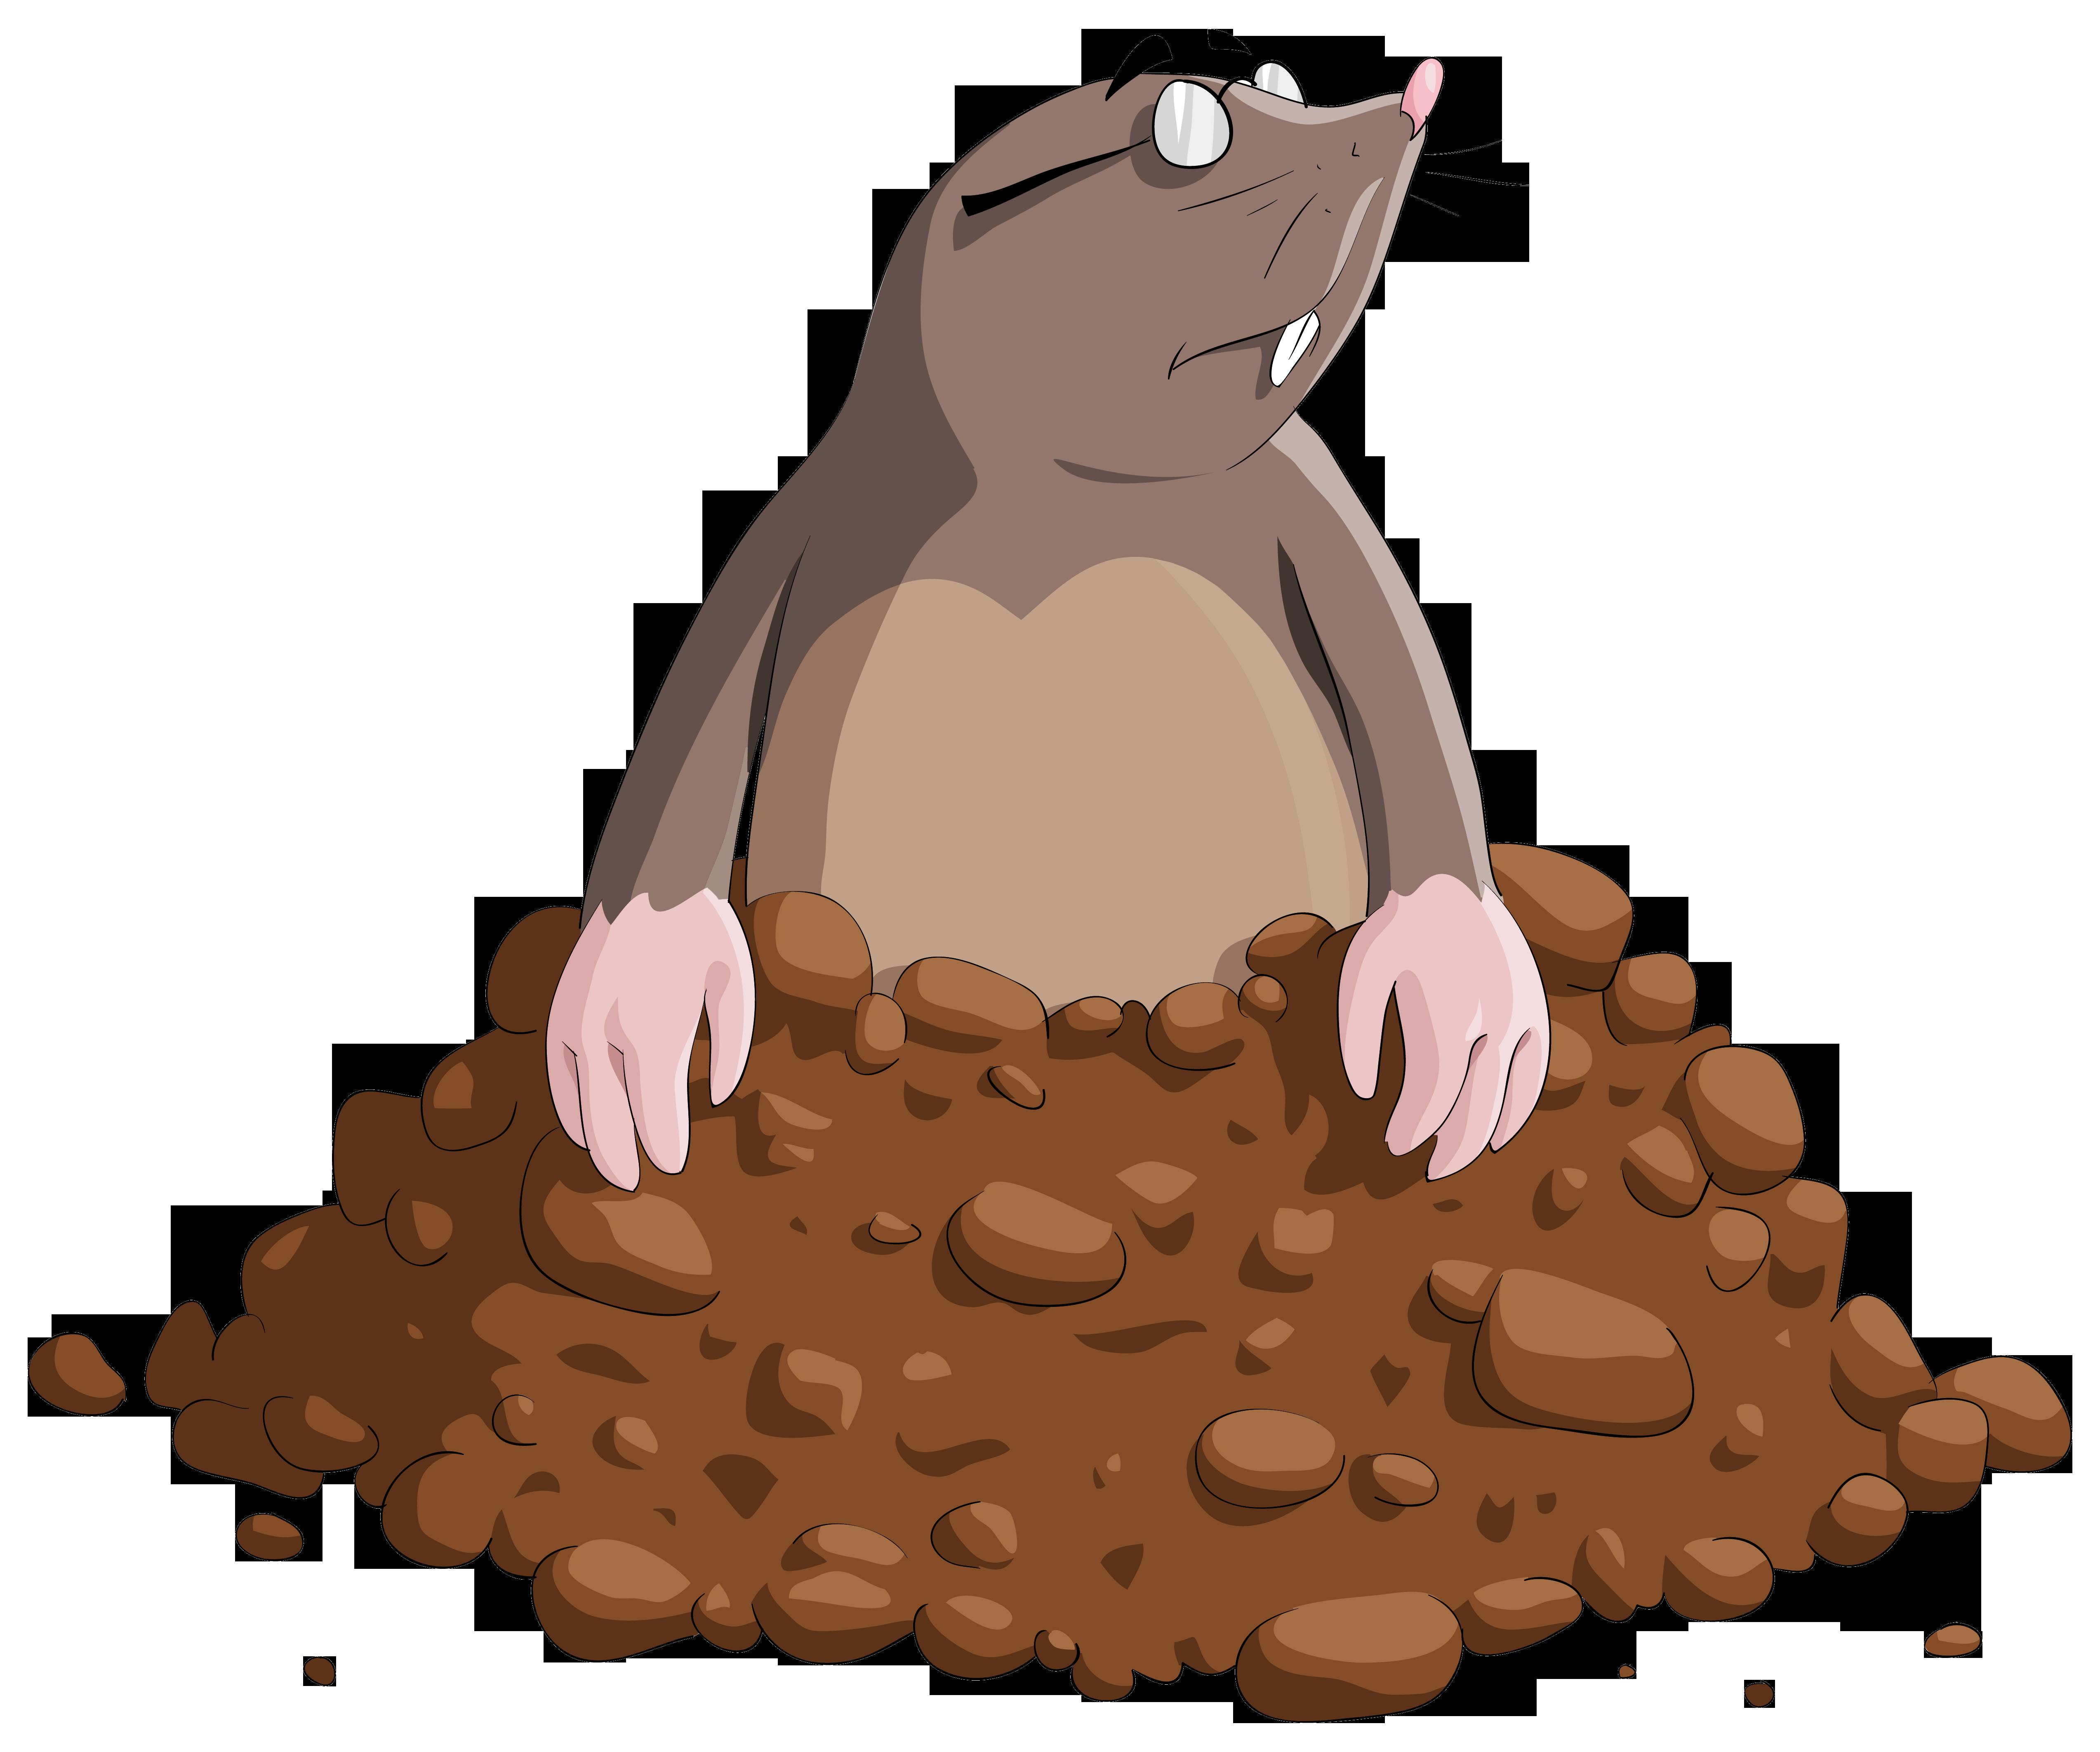 Mole Cartoon PNG Clipart Image.